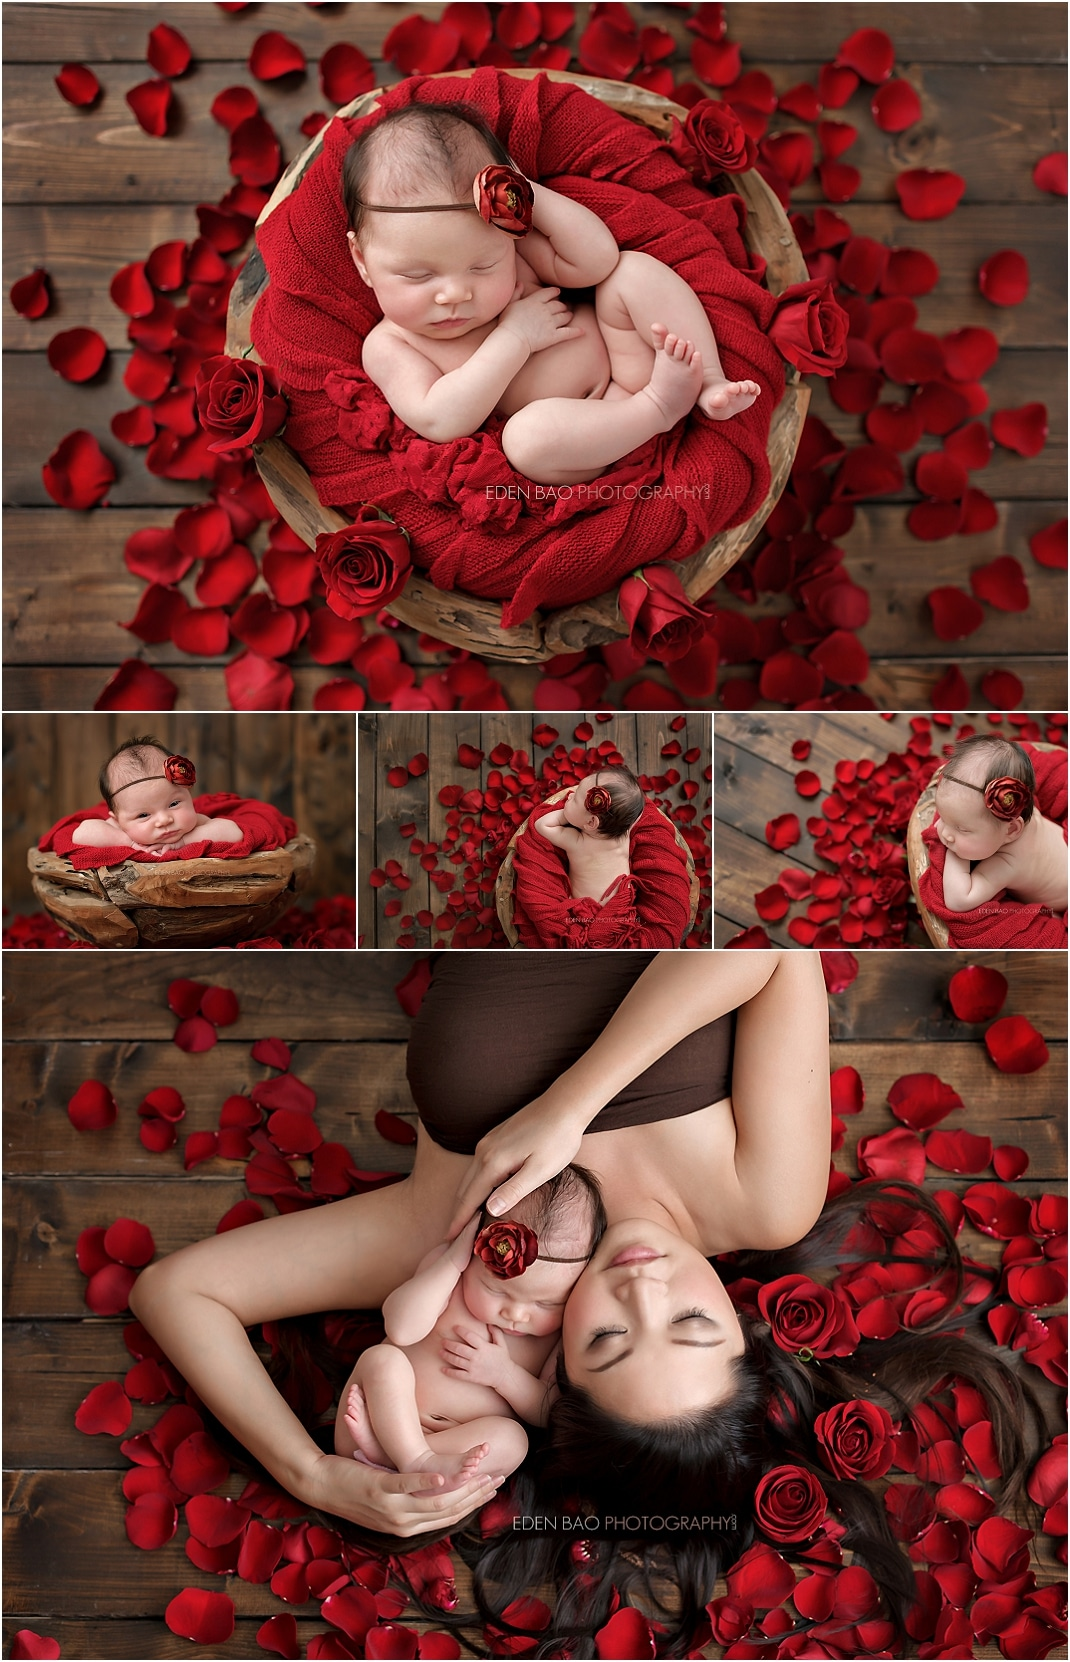 Newborn Photographer Northwest Seattle red rose petals